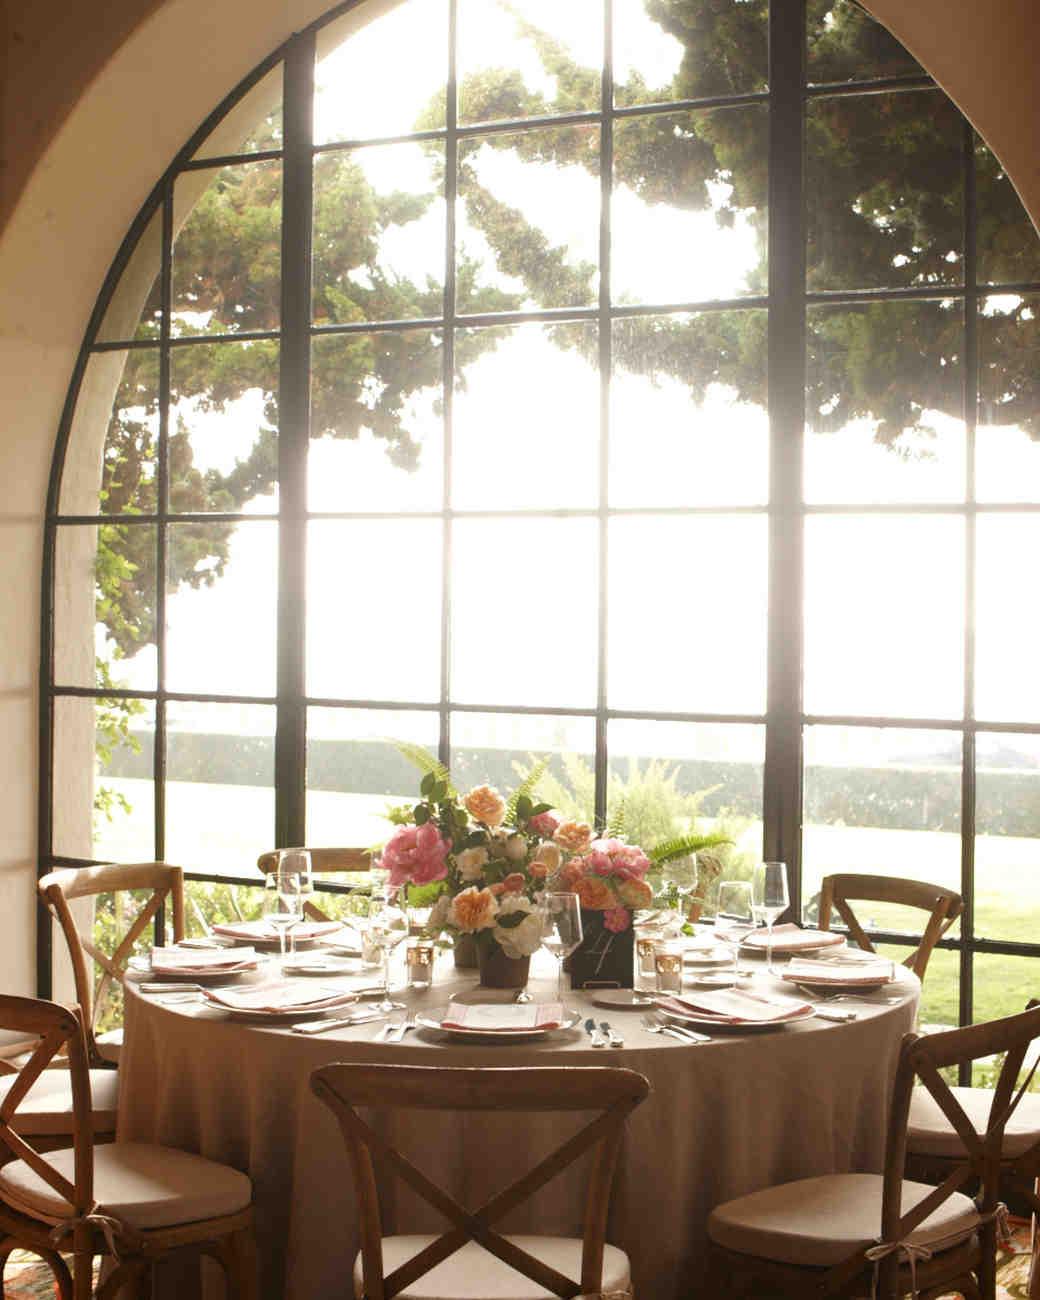 kristi-jeff-reception-table-wd109382.jpg